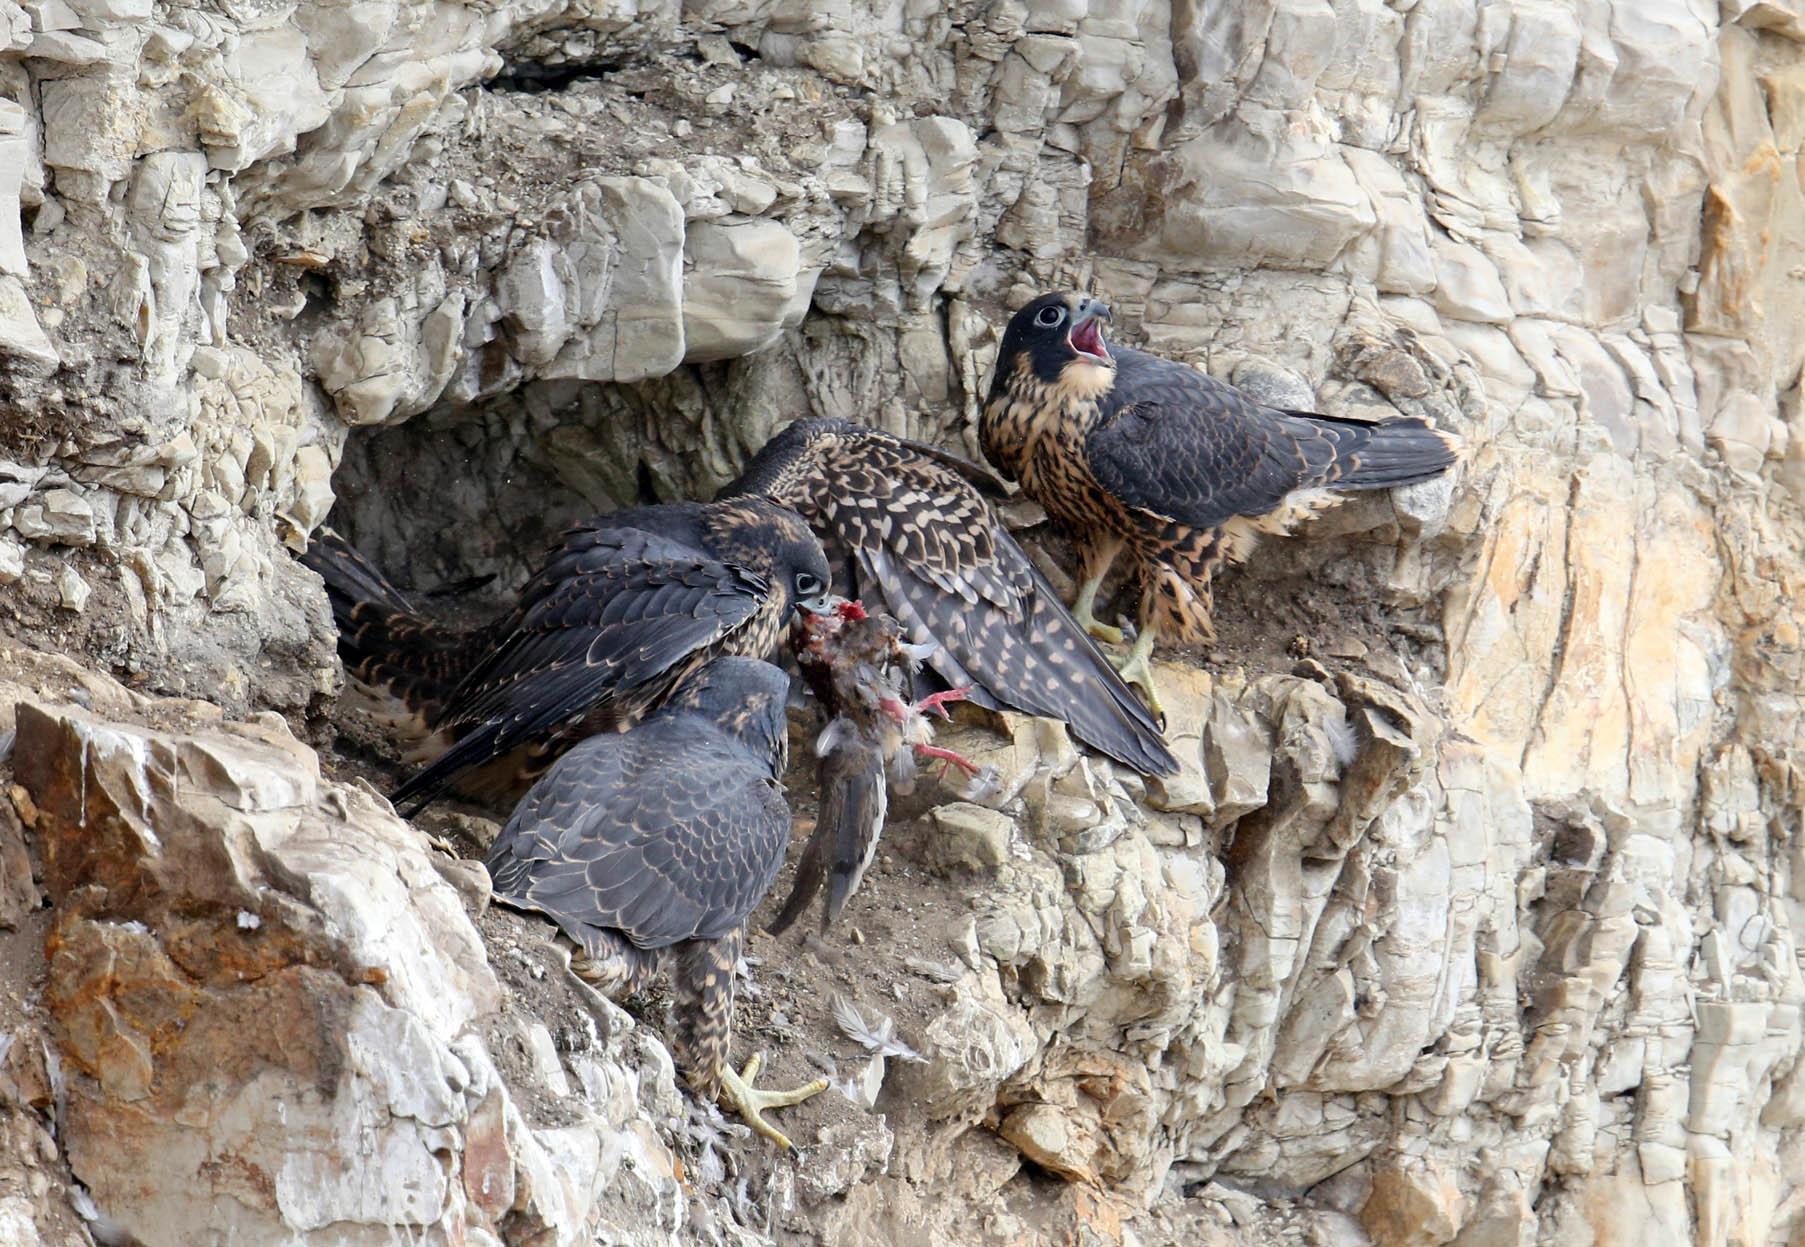 Chicks squabbling